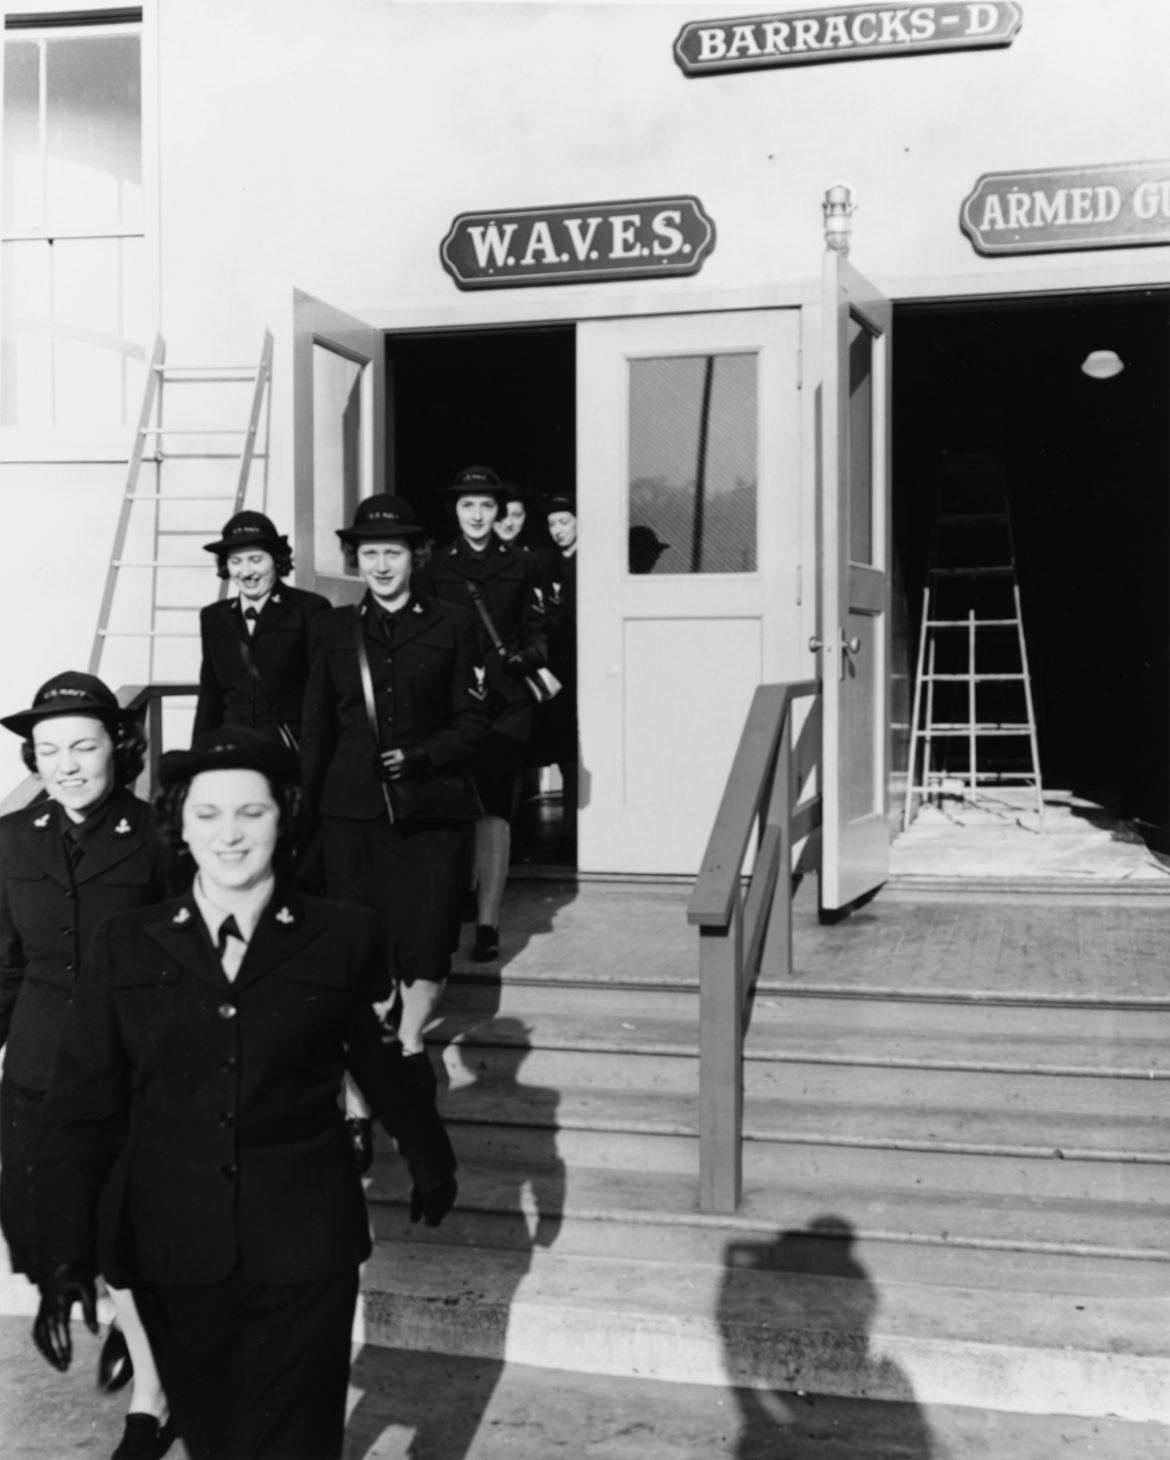 WAVES Leaving Barracks at NAAF Treasure Island